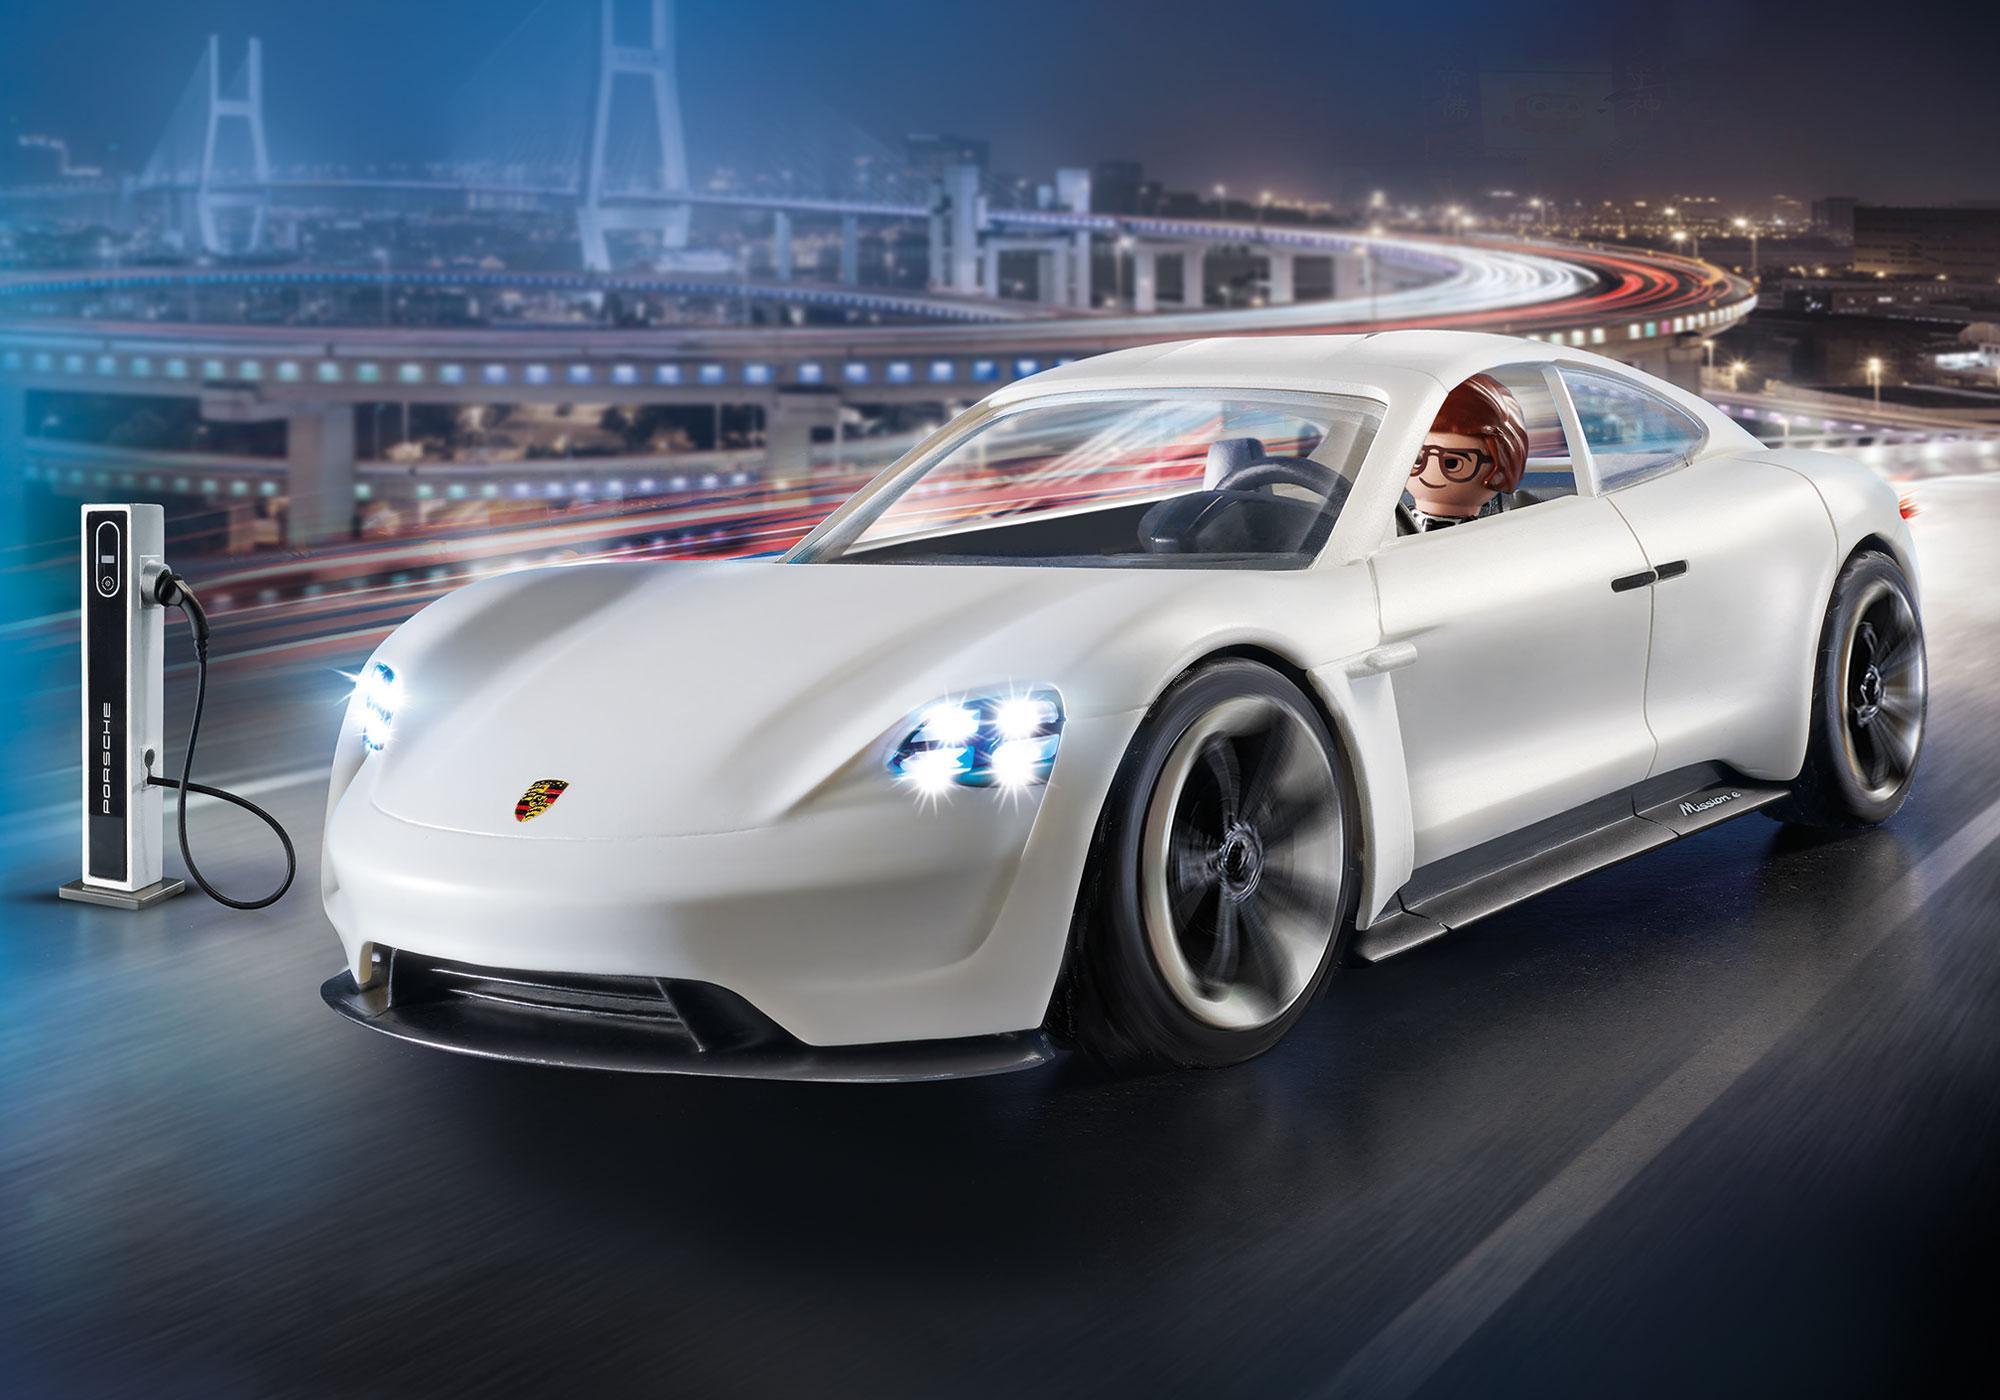 http://media.playmobil.com/i/playmobil/70078_product_detail/PLAYMOBIL: THE MOVIE Rex Dasher's Porsche Mission E